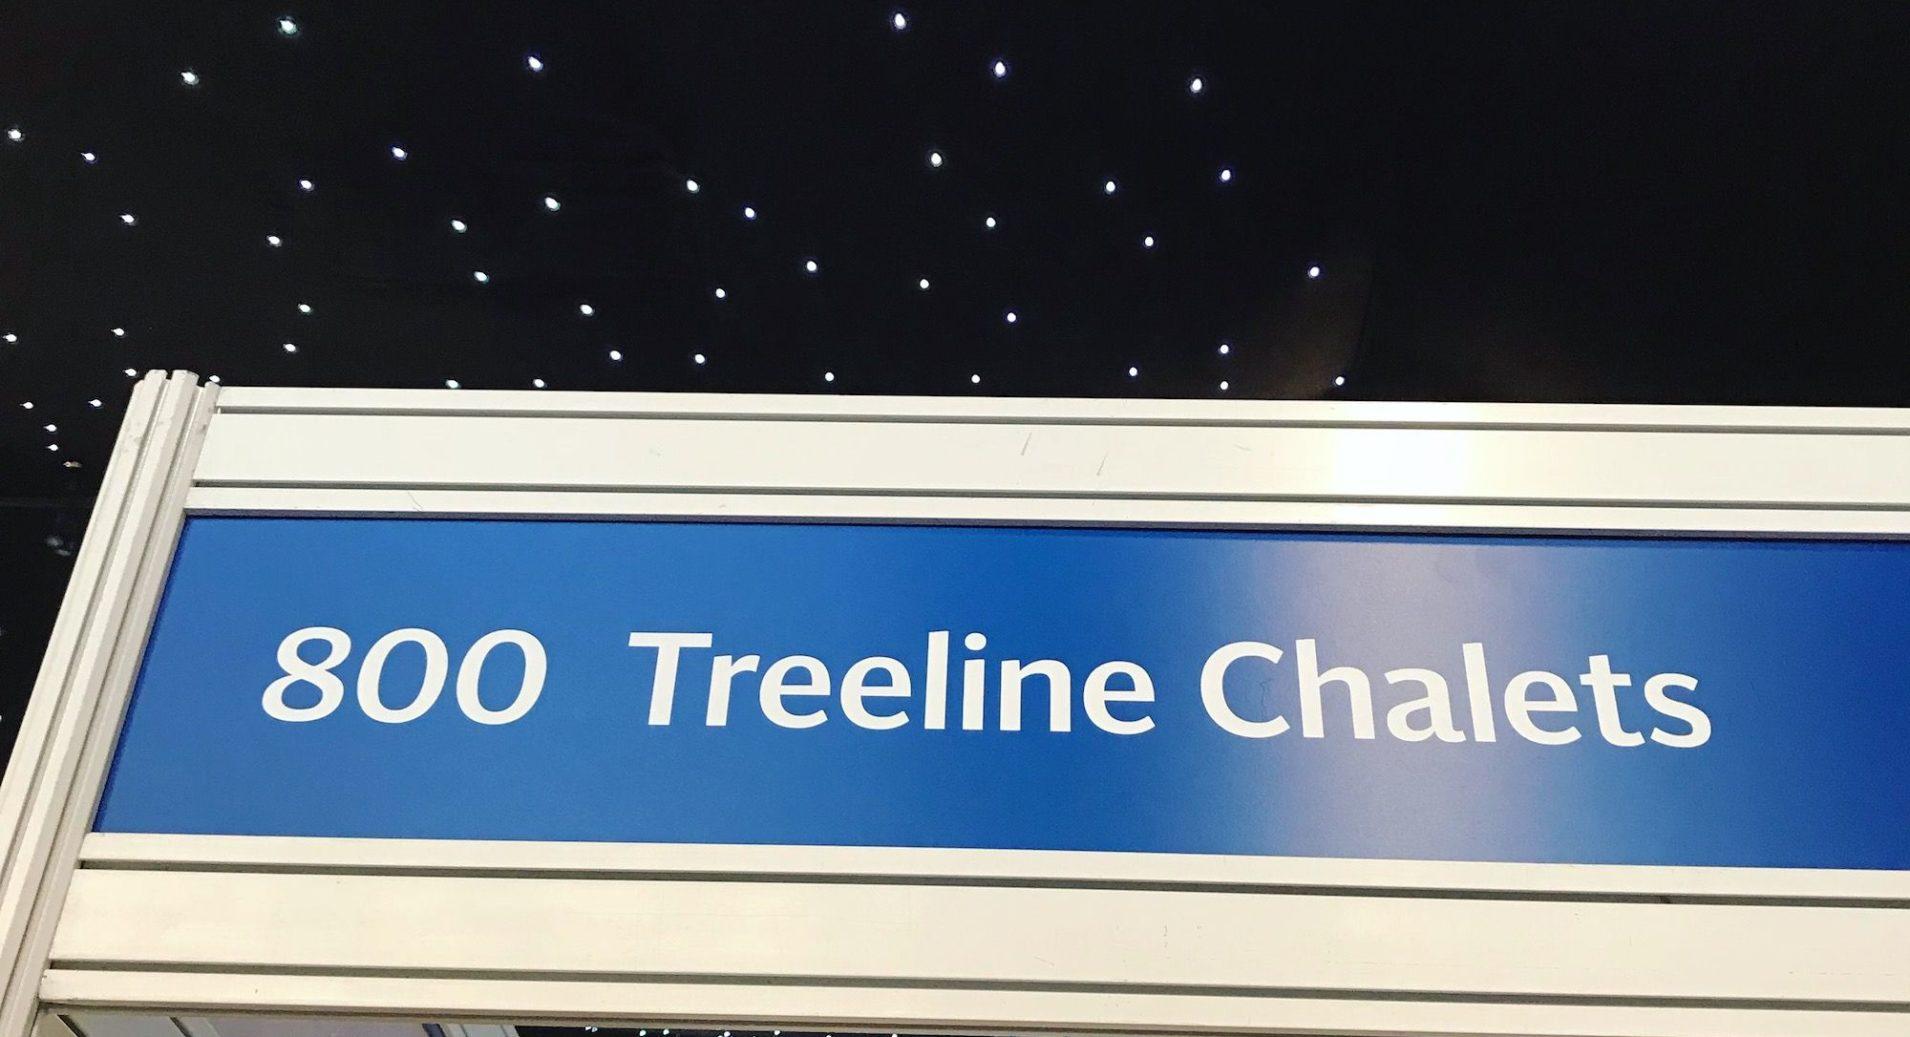 Treeline-Chalets-Ski-show-London